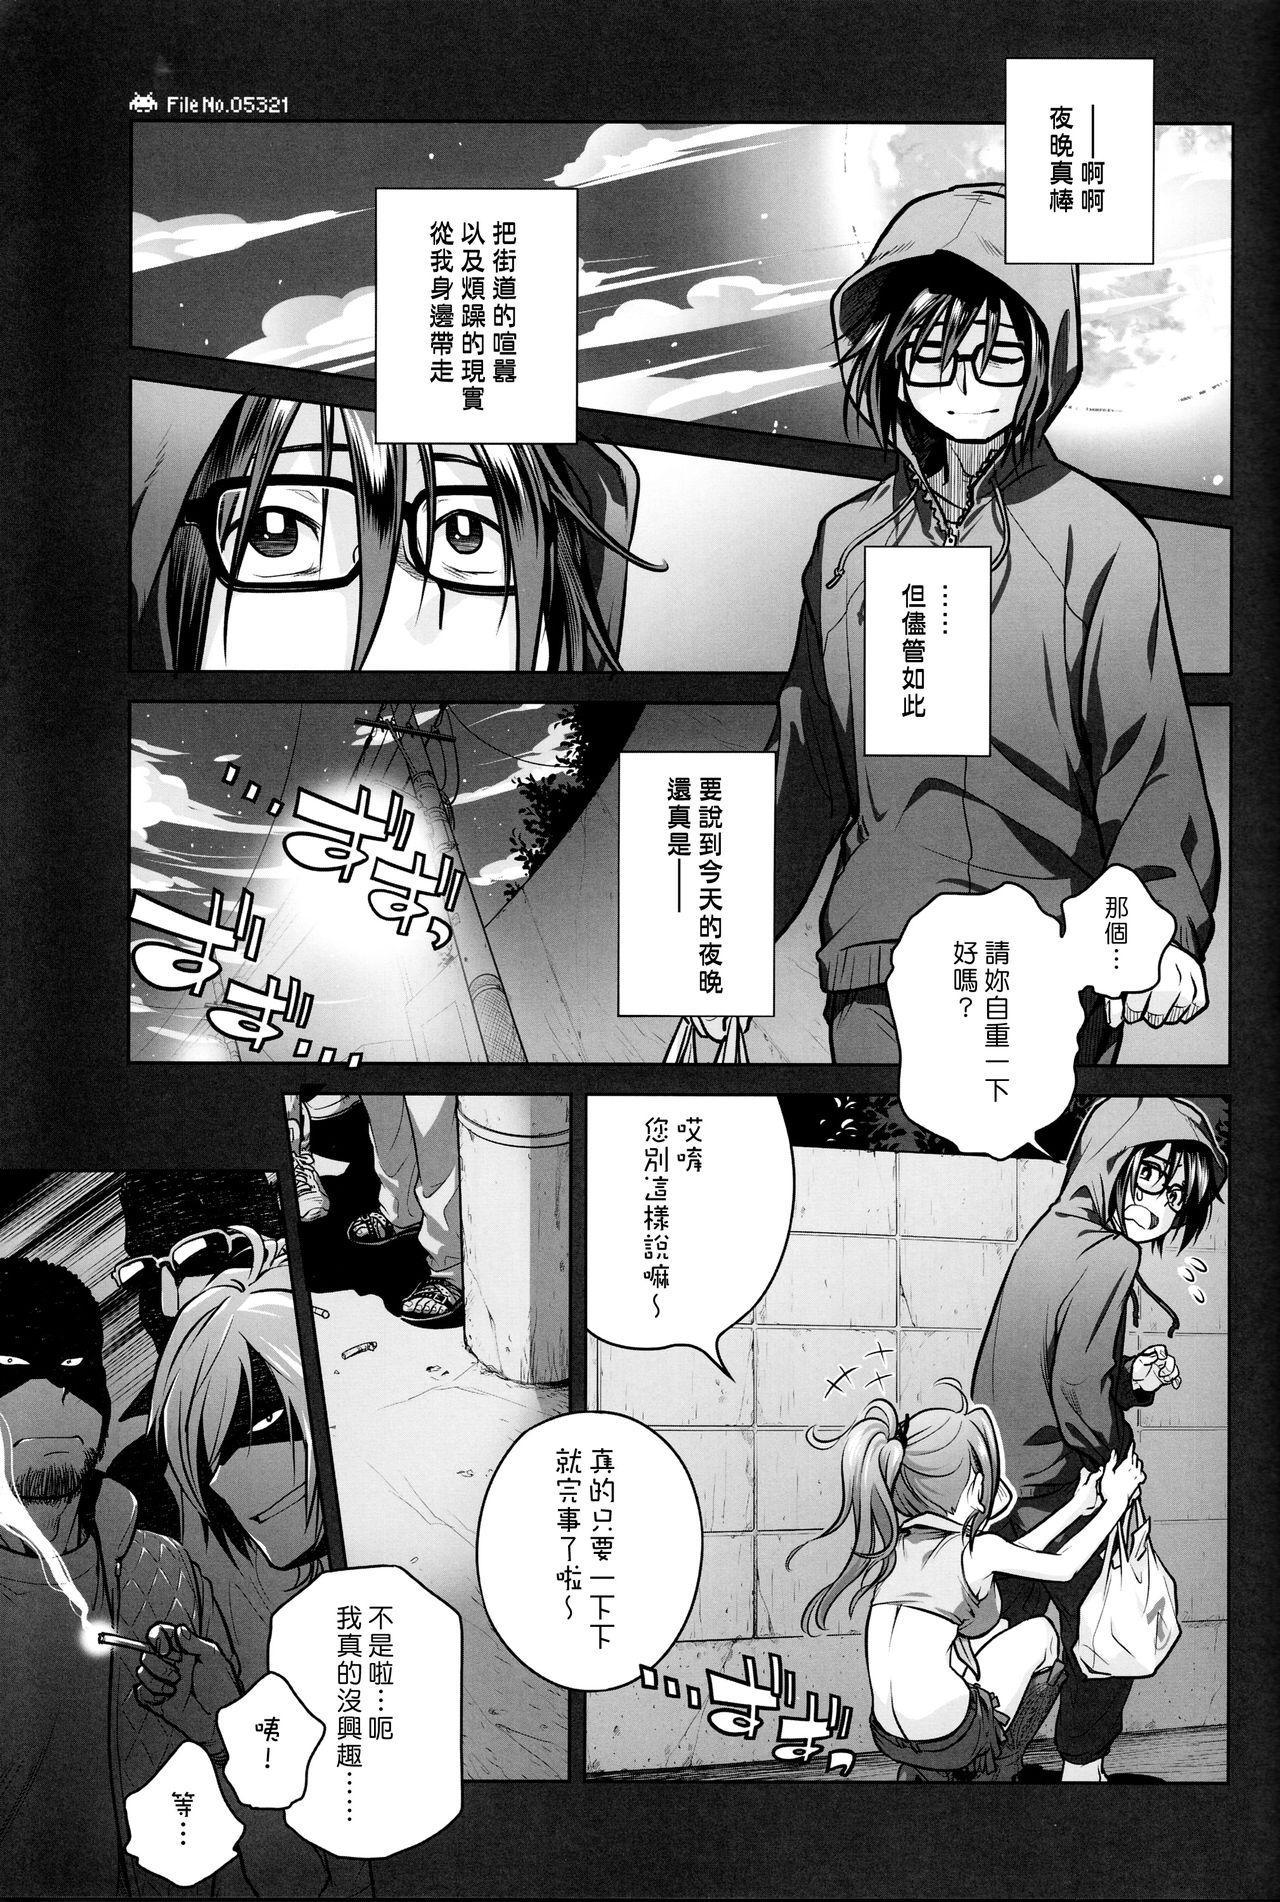 Sorako no Tabi 6 2